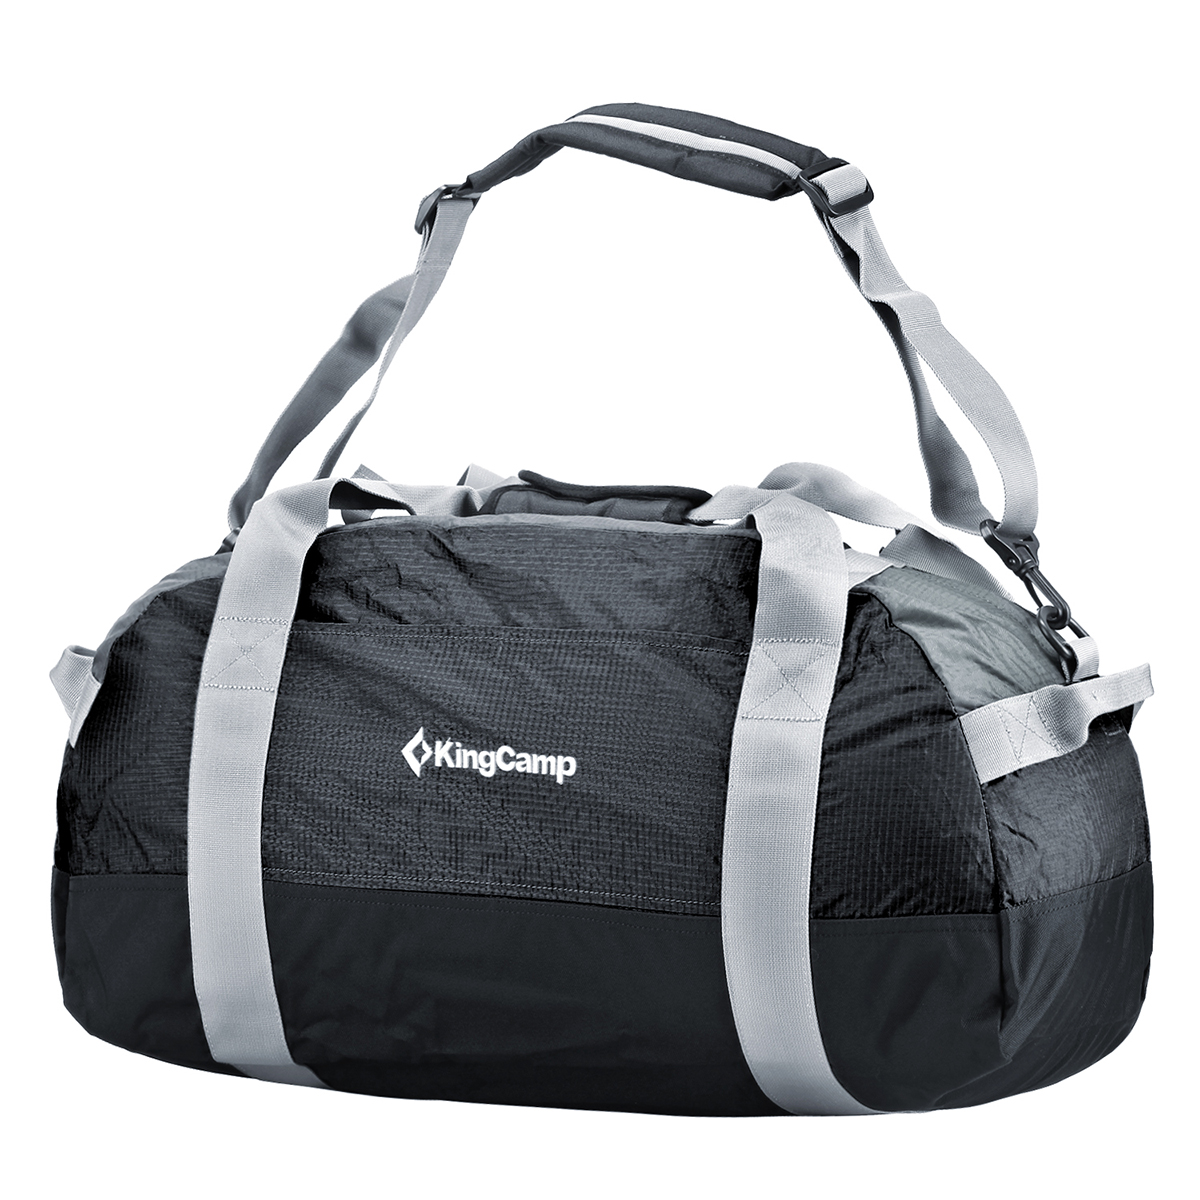 Сумка-баул для путешествий AIRPORTER, цвет: черный. 120 л332515-2358АIRPORTER 120 сумка-баул для путешествий, шопинга в чехлеАртикул KB4307Объем: 120 литровРазмеры: 90 х 38 х 36 см Упаковка: 28 х 17 х 10 см Материал: нейлон 210D Double RipStop PU from Korea, полиэстер